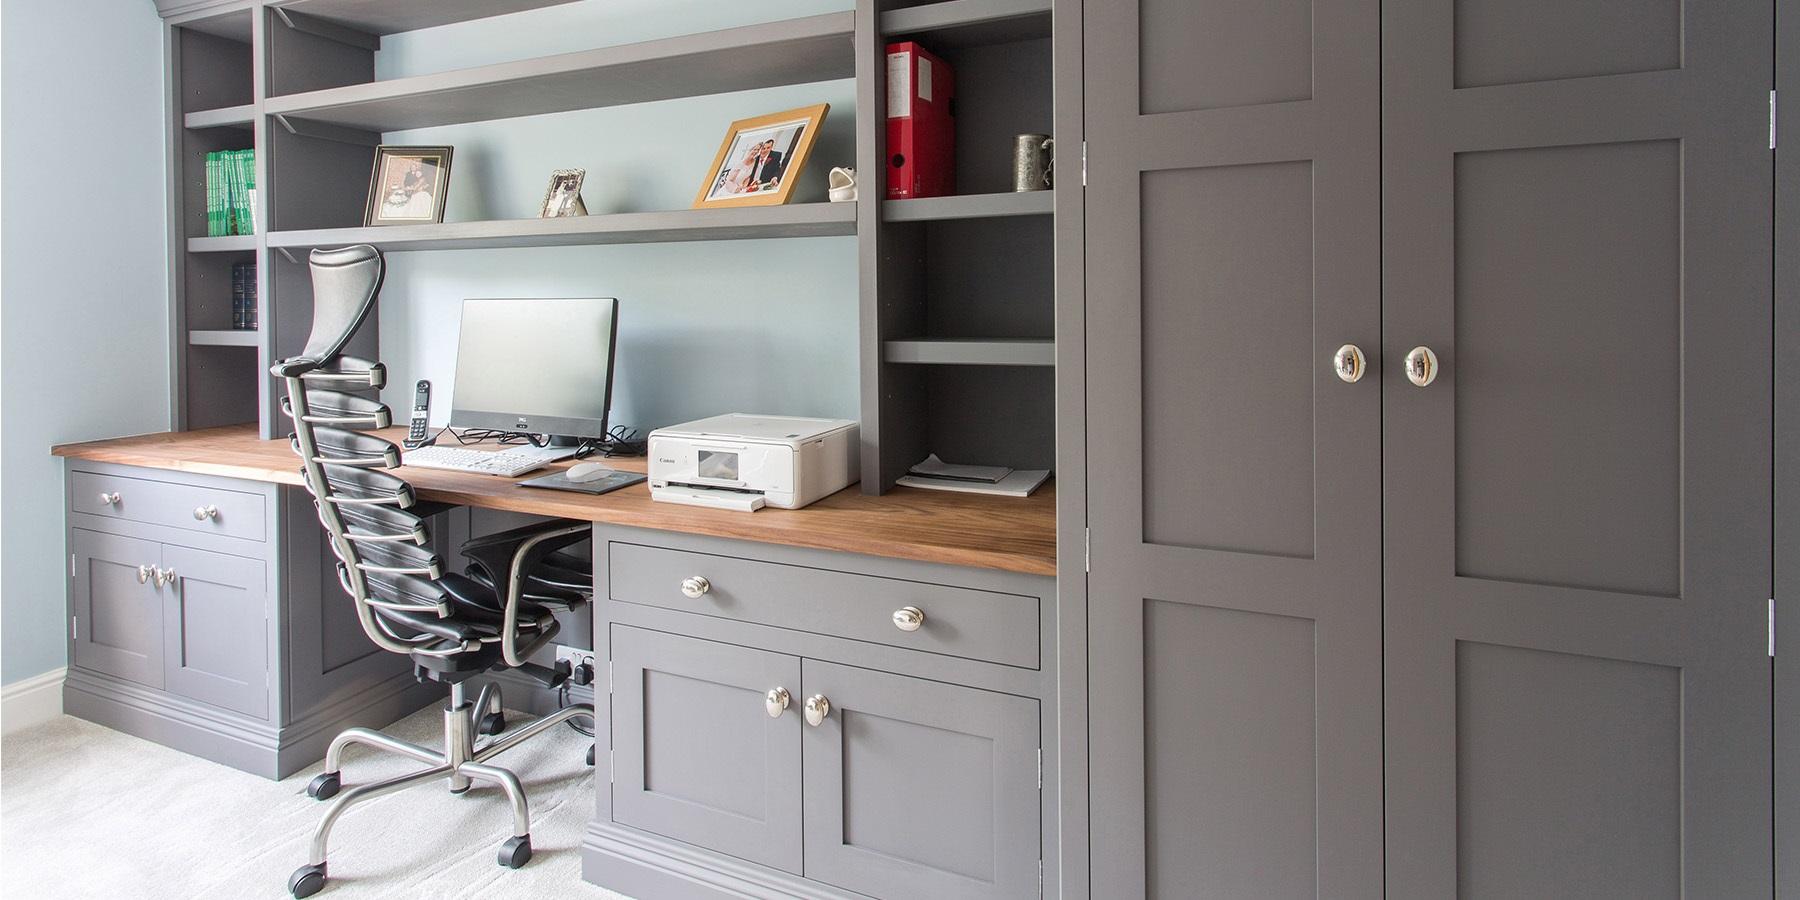 Burlanes Interiors   Bespoke, Handmade Home Office And Study Furniture